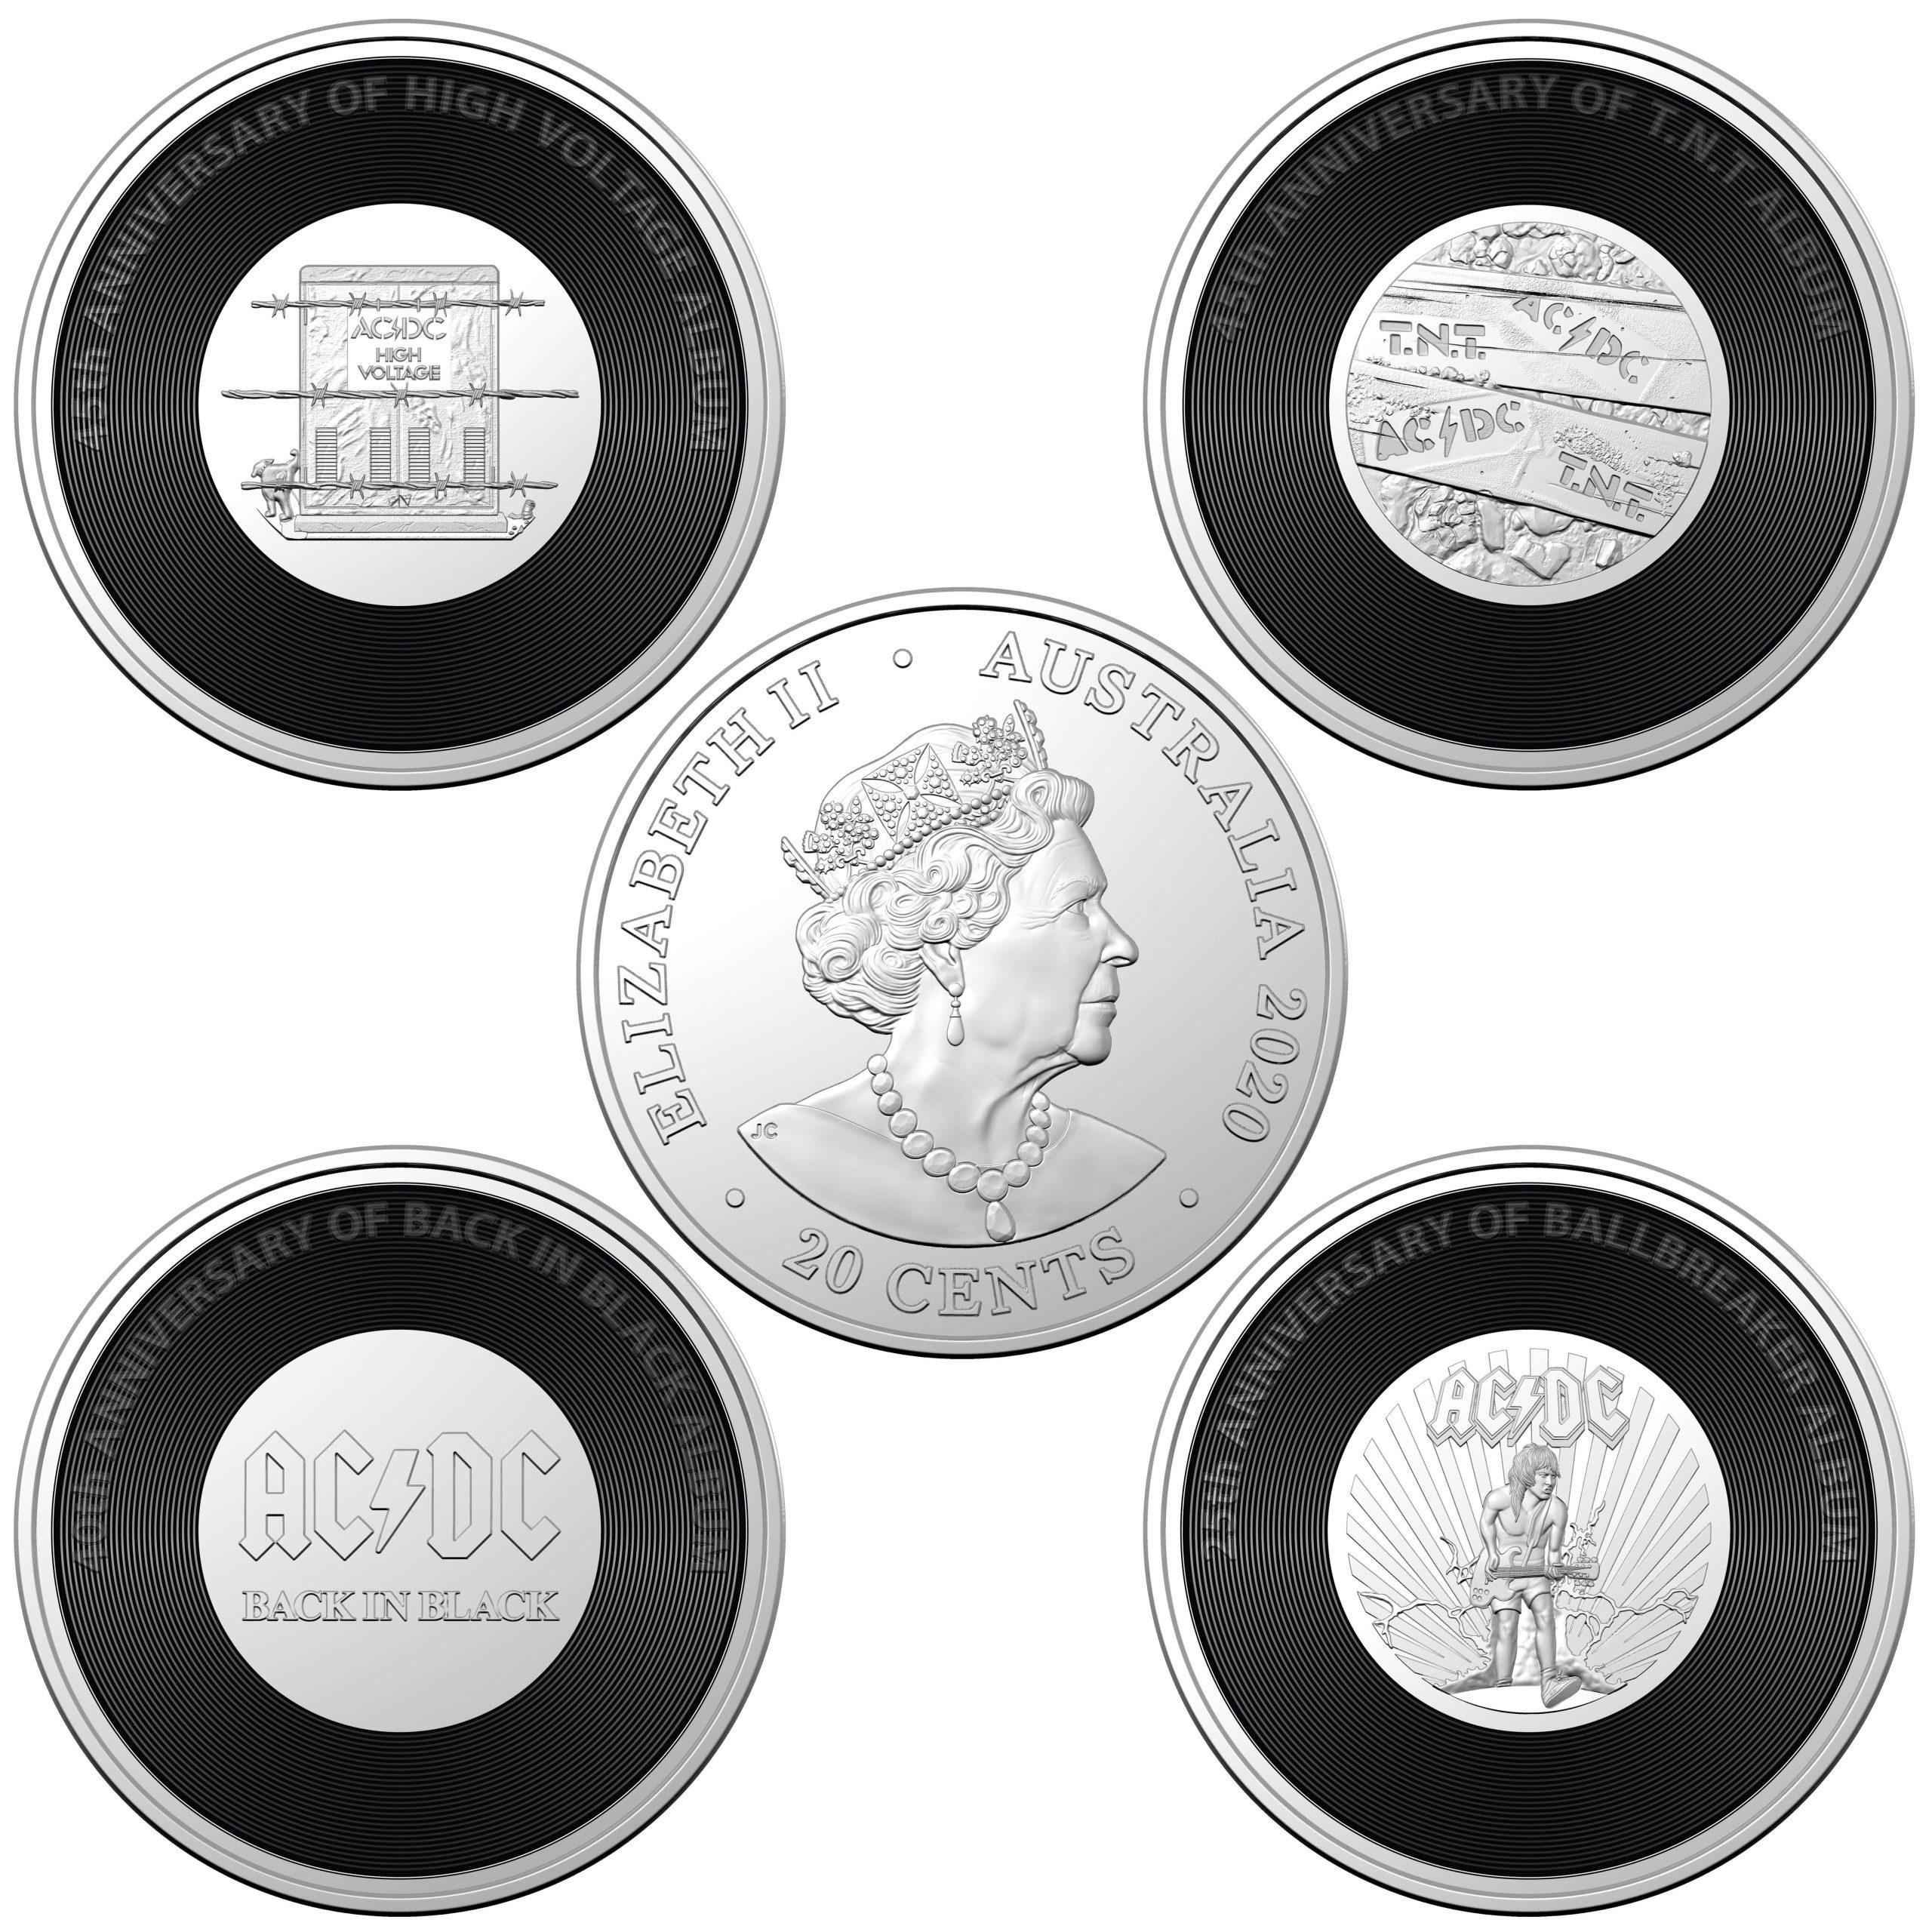 2020/2021 - AC/DC Seven Coin Collection - 20c Coloured CuNi Unc Coins 6